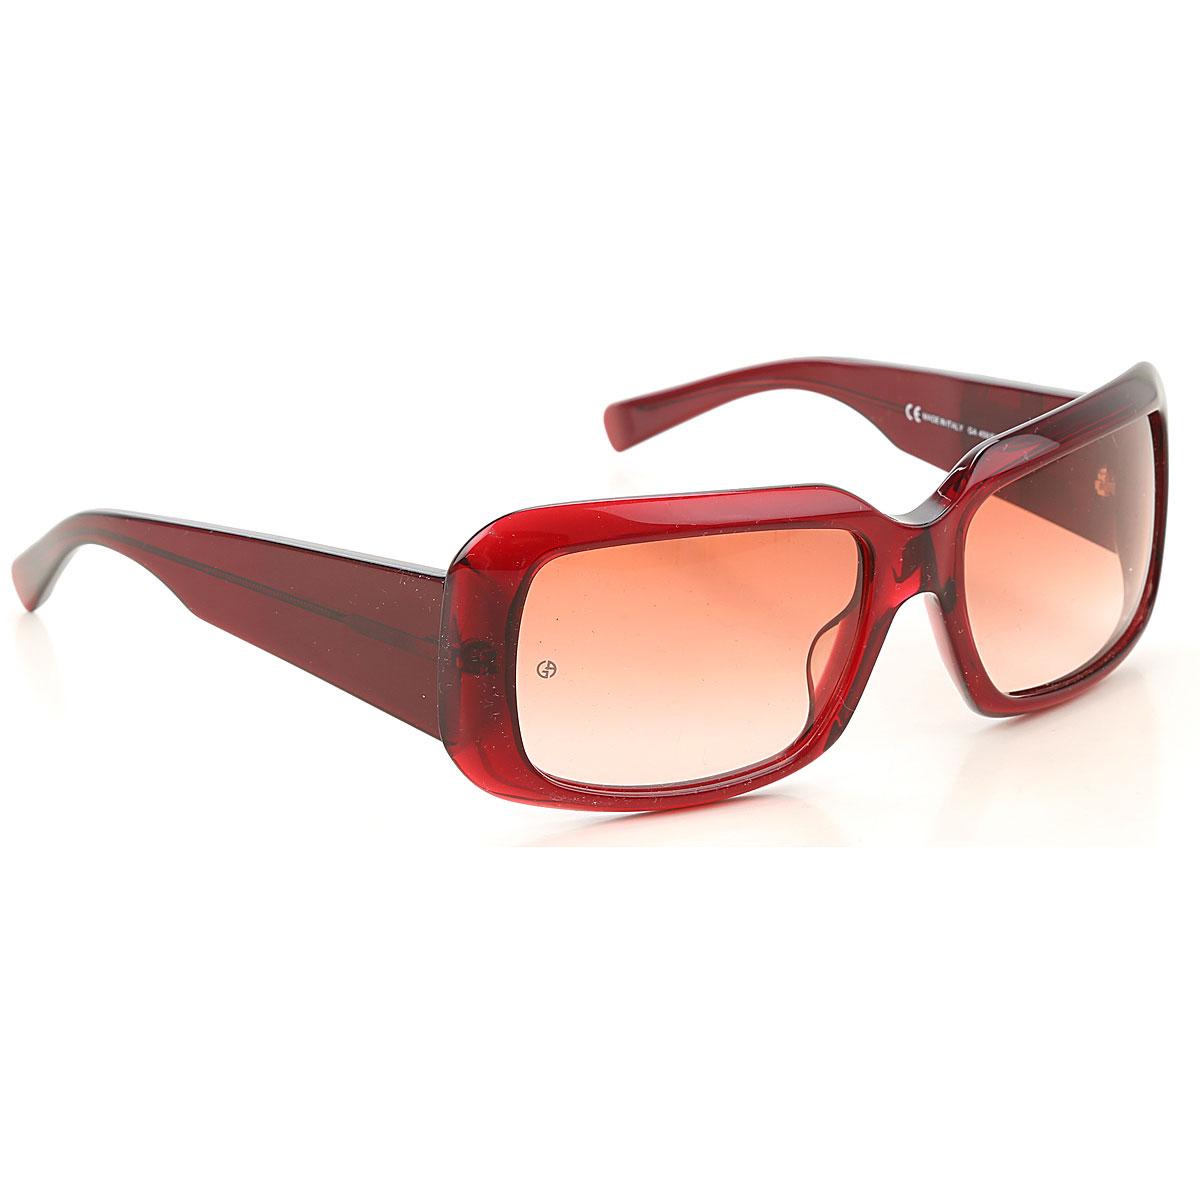 Giorgio Armani Sunglasses On Sale, Burgundy, 2019